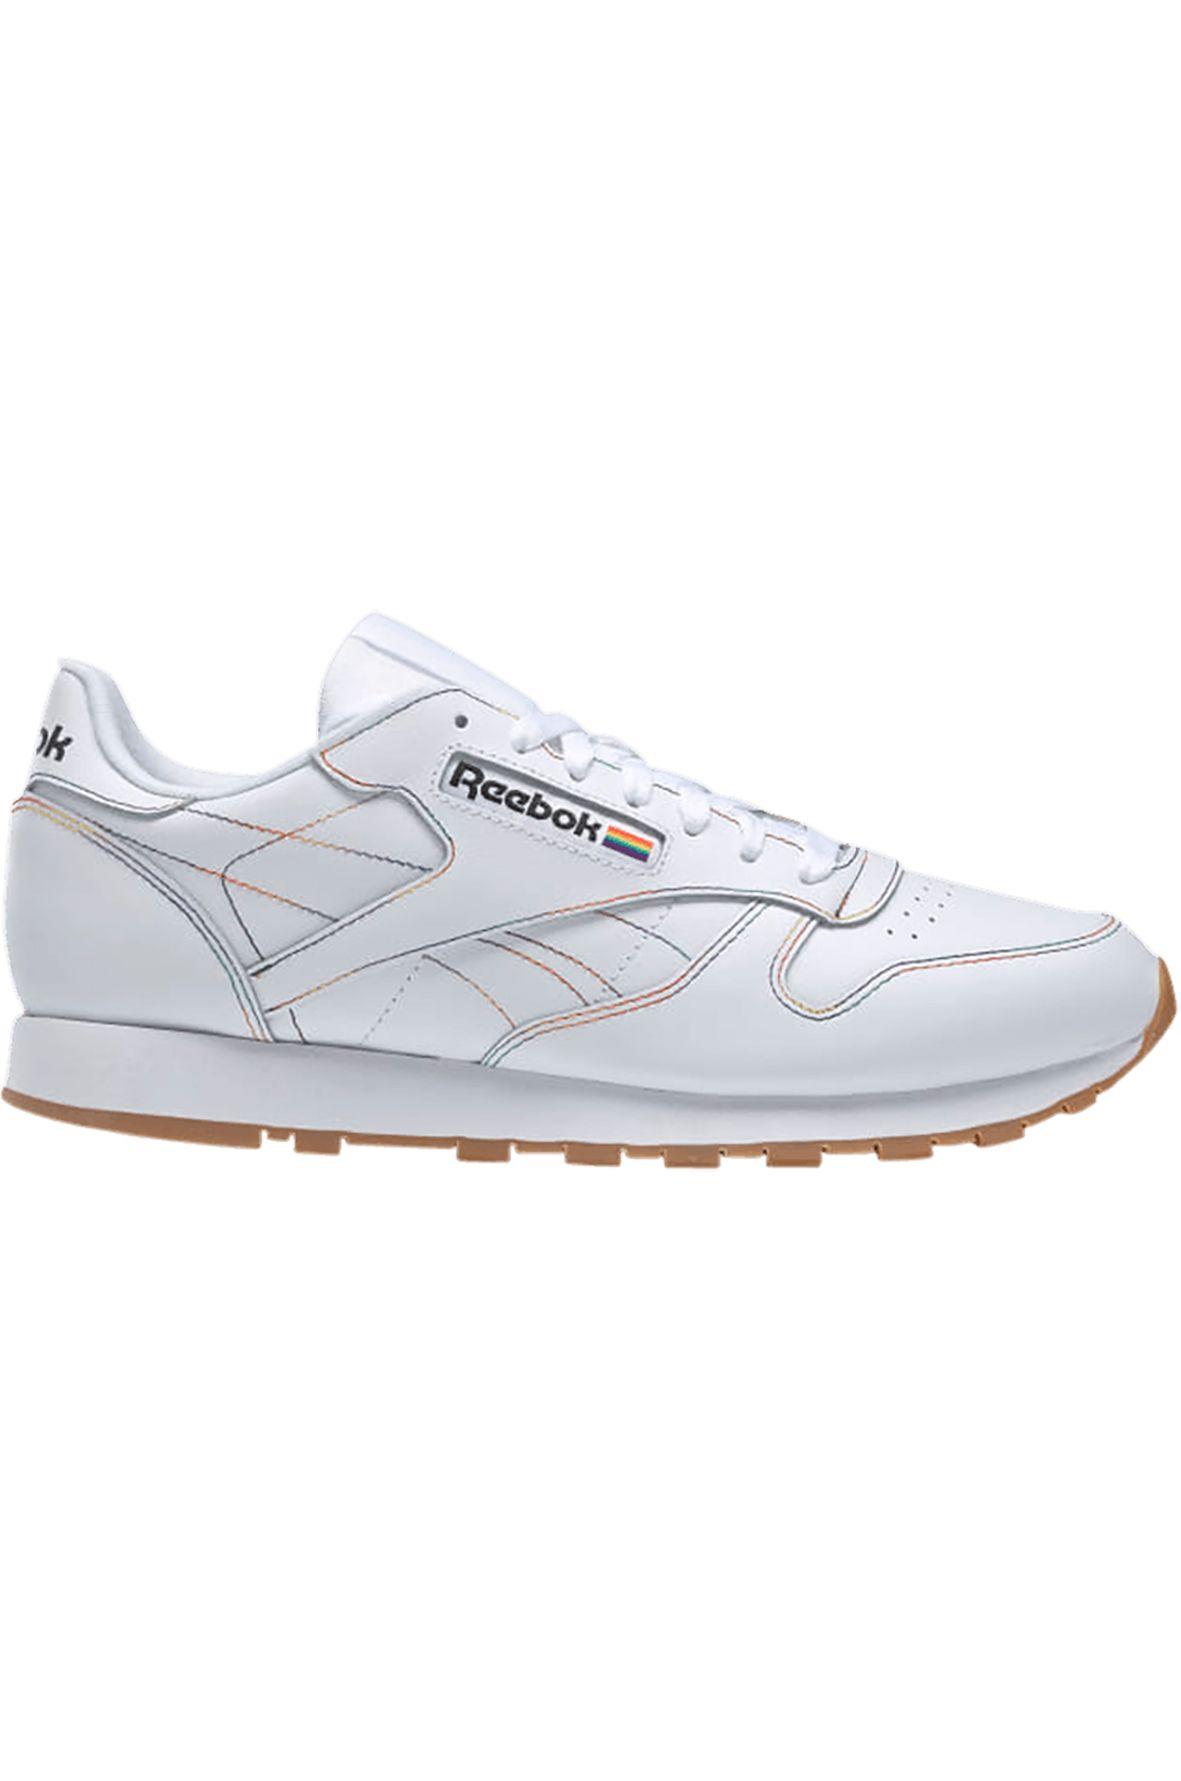 Tenis Reebok CL LTHR White/Emeral/Cobalt